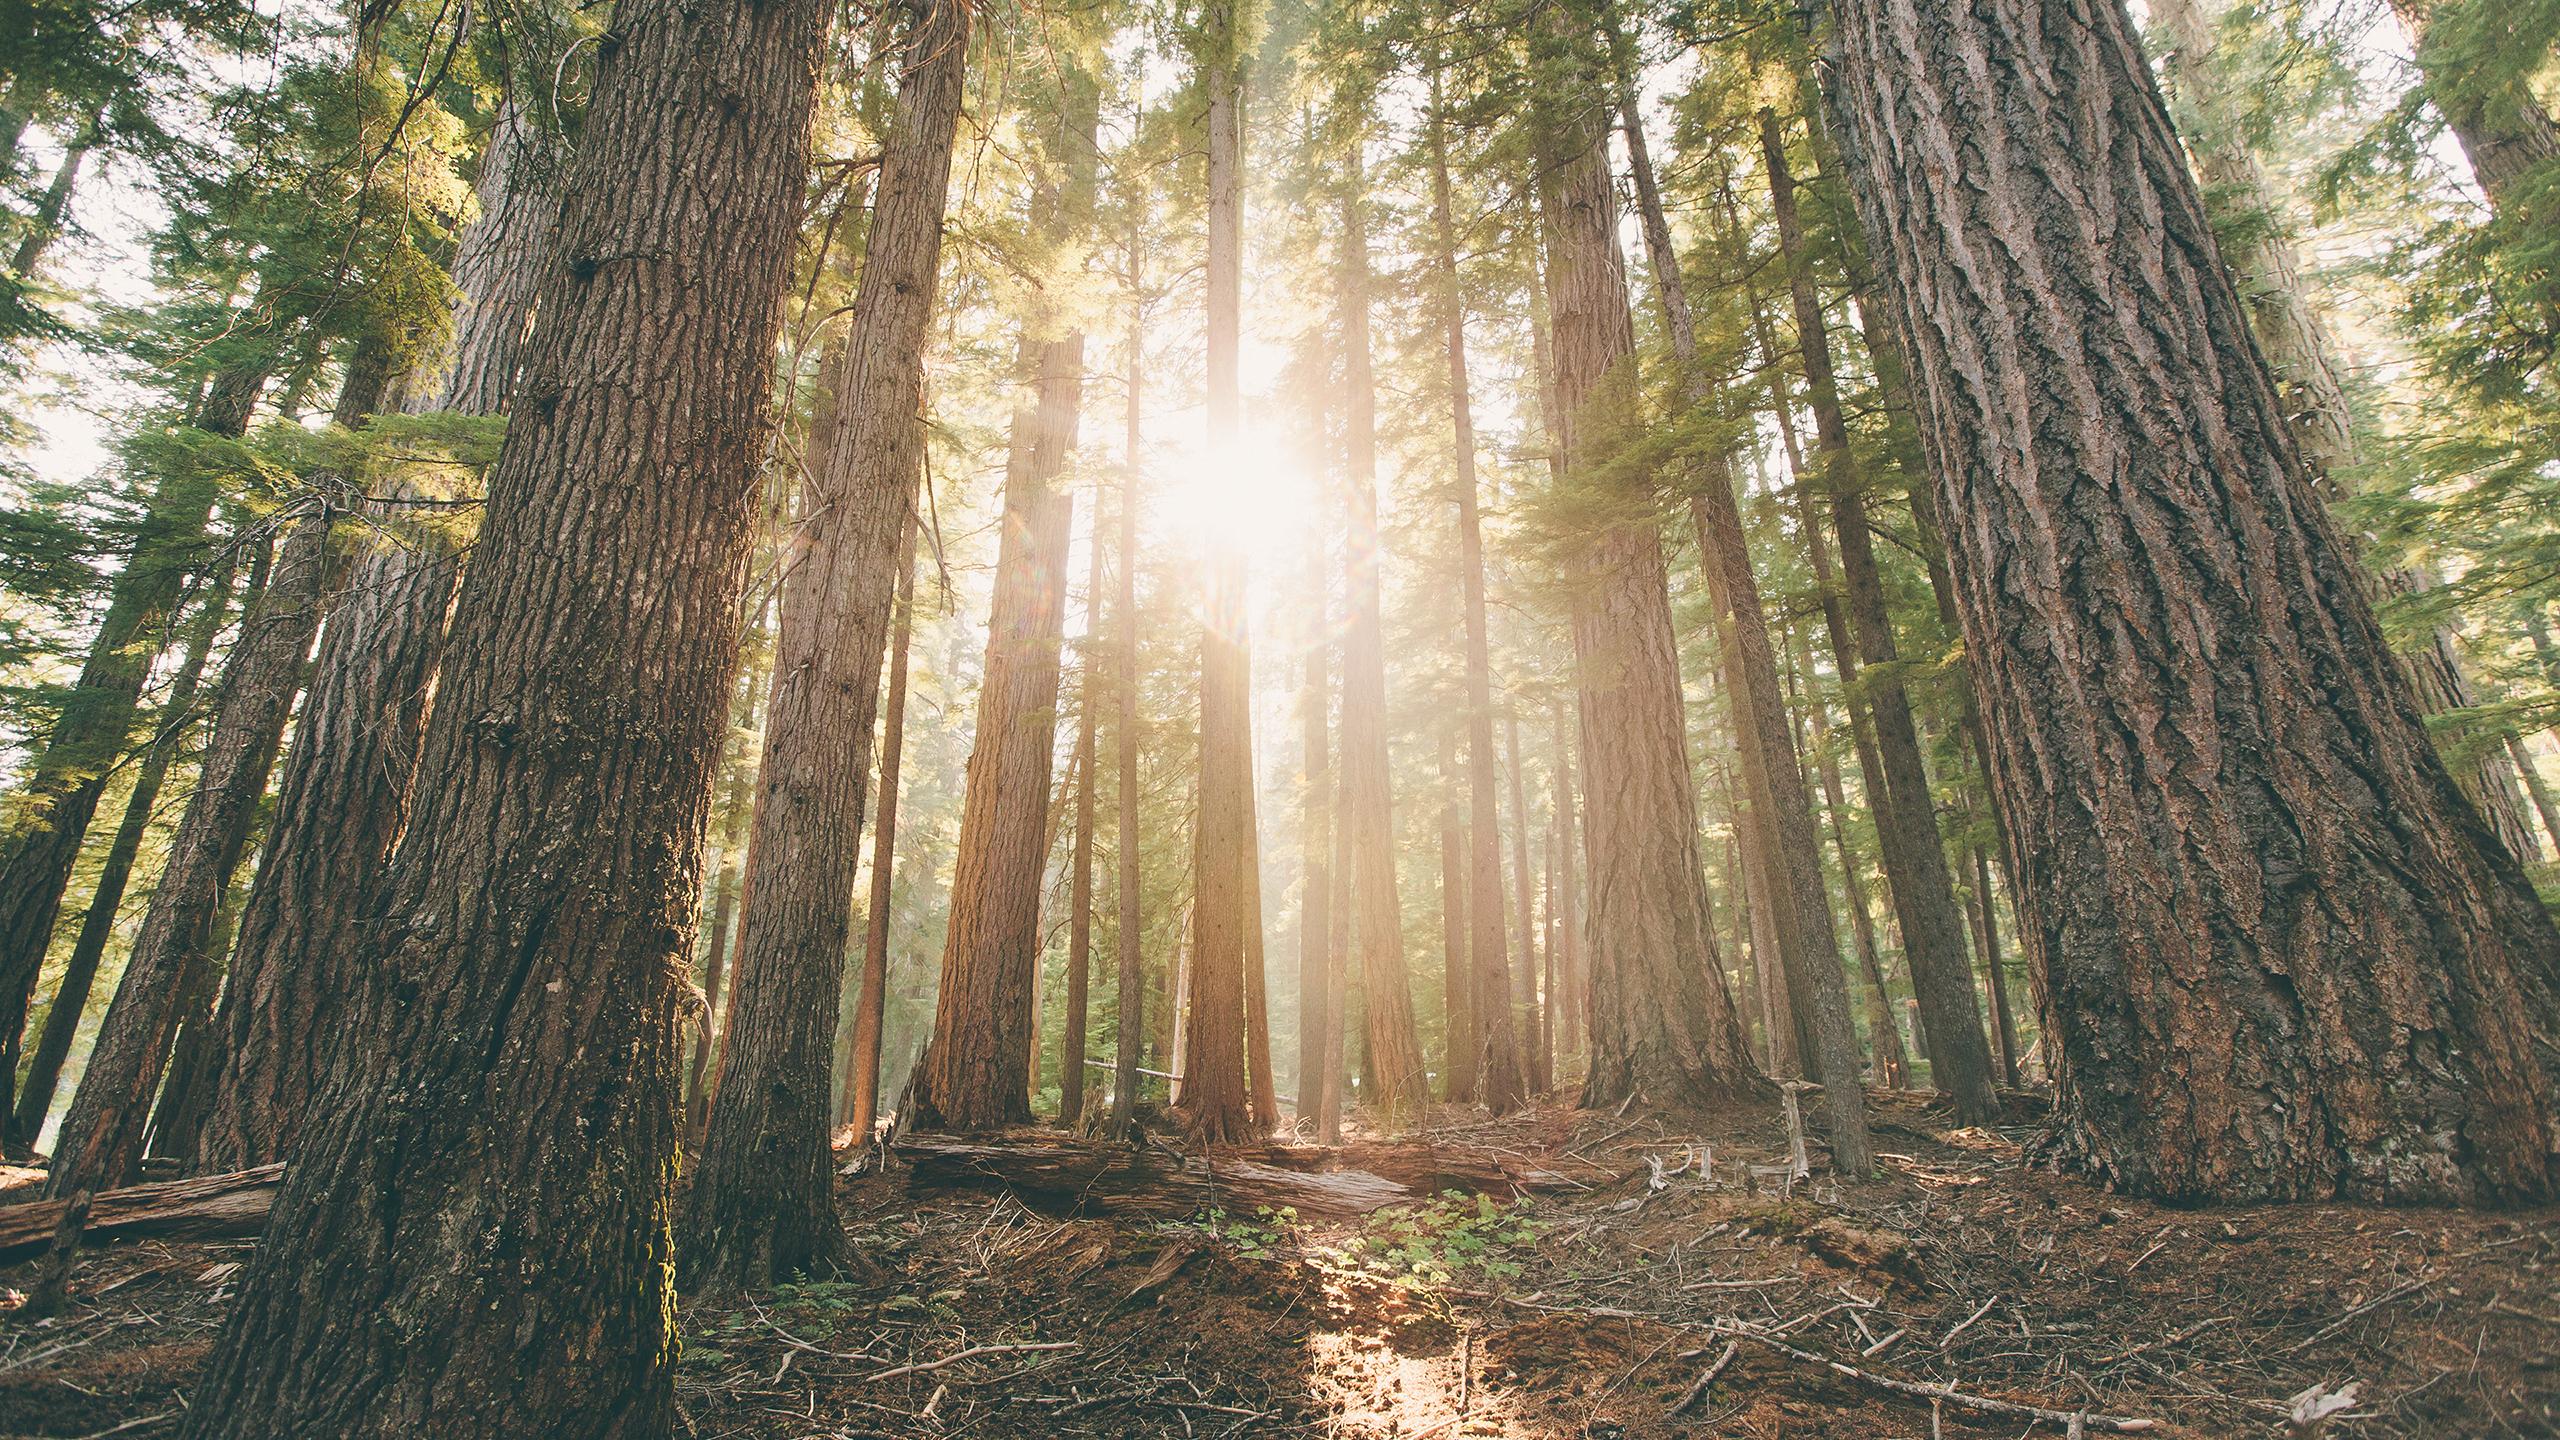 light_in_forest_wallpaper_2560x1440